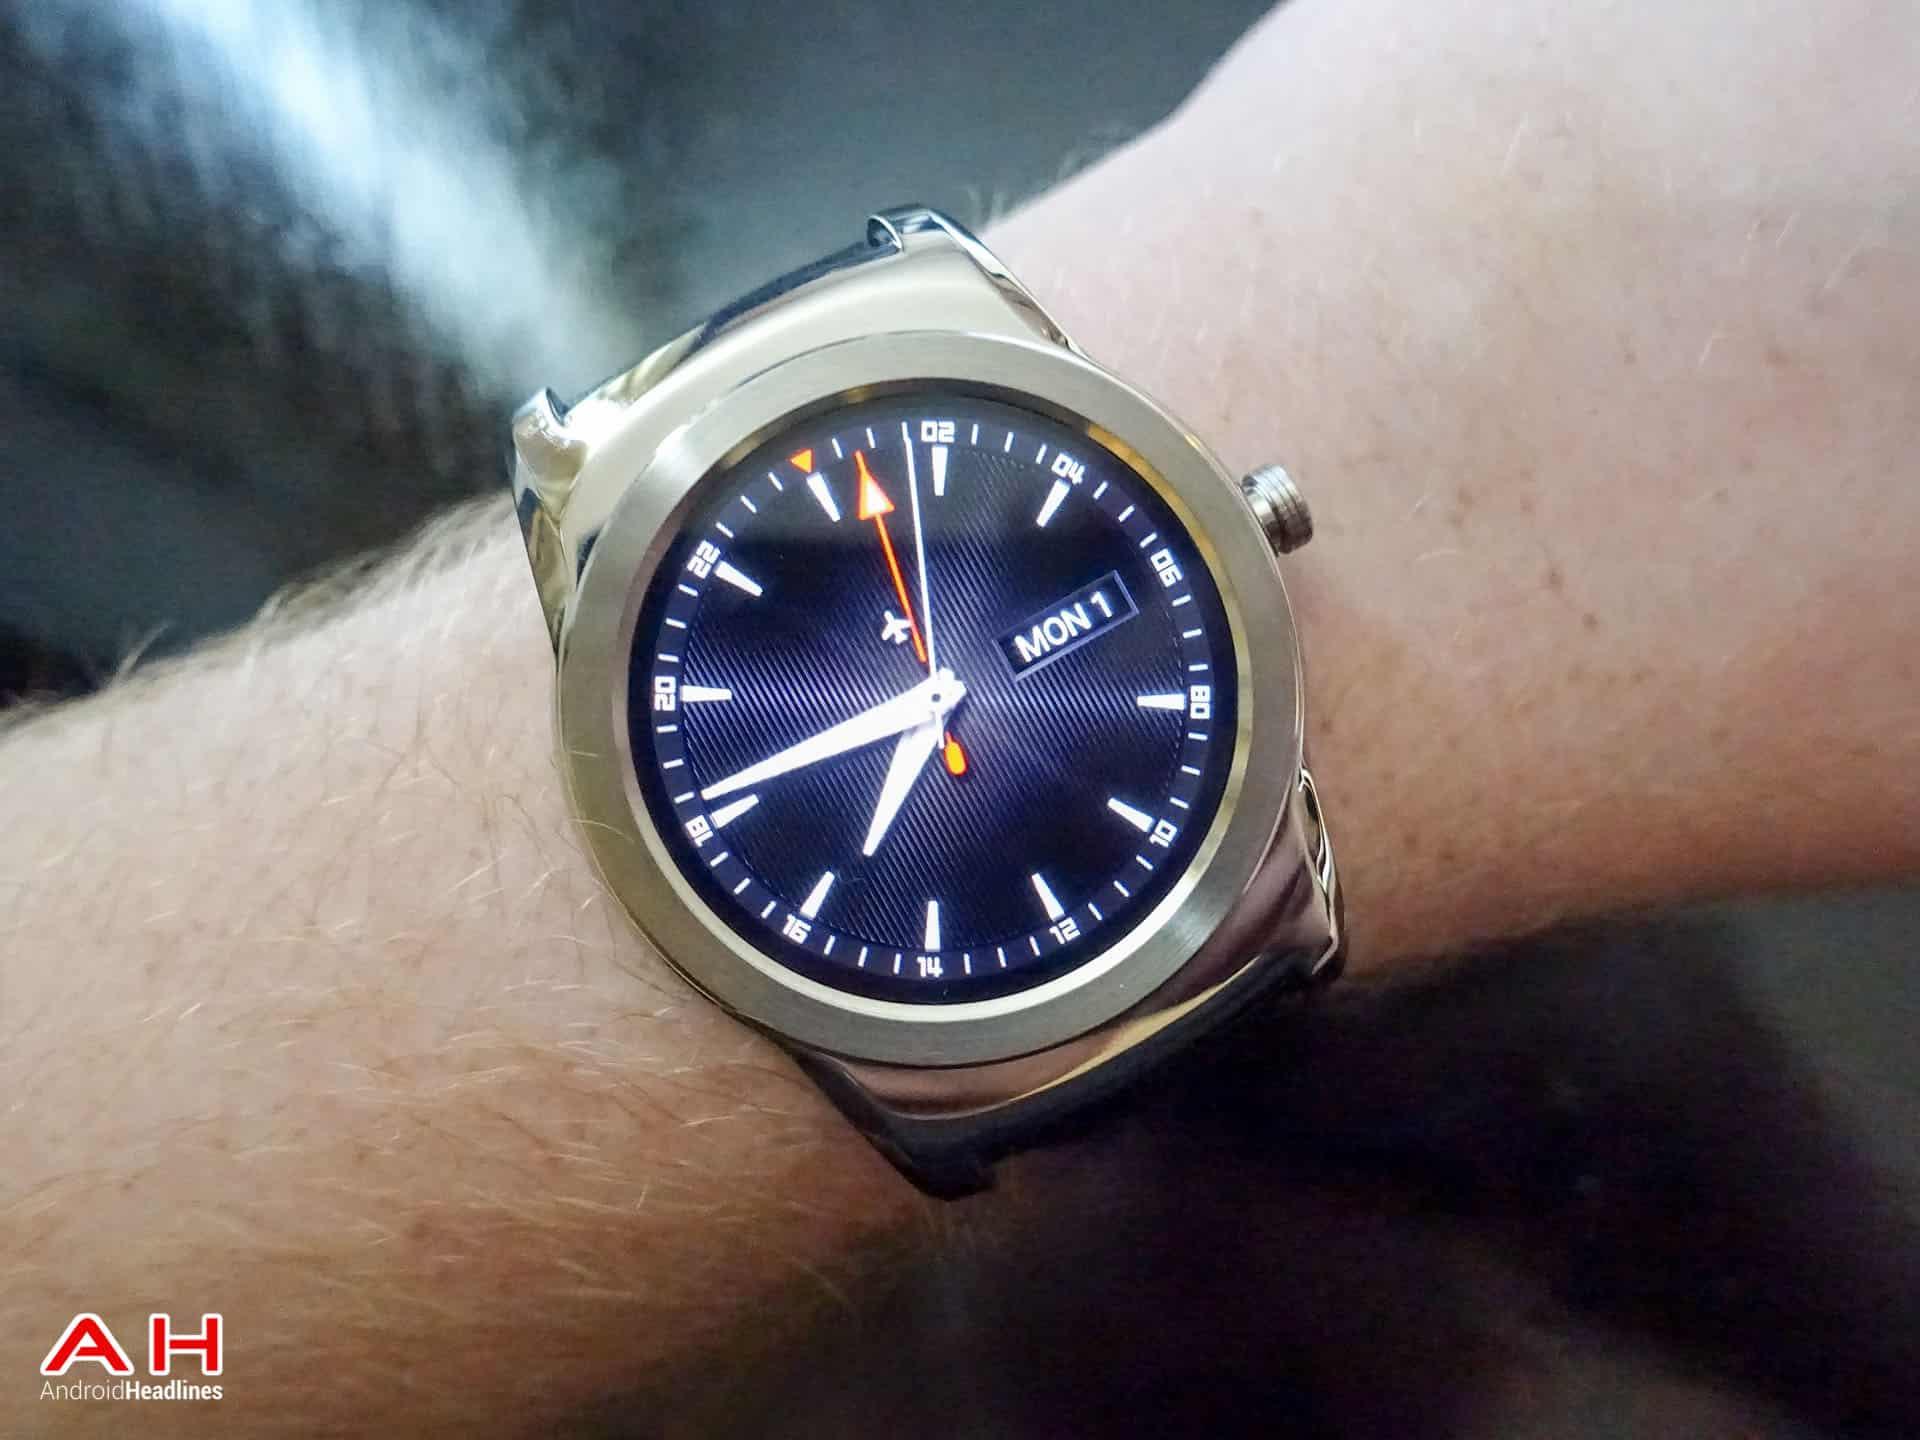 LG Watch Urbane Review AH 7